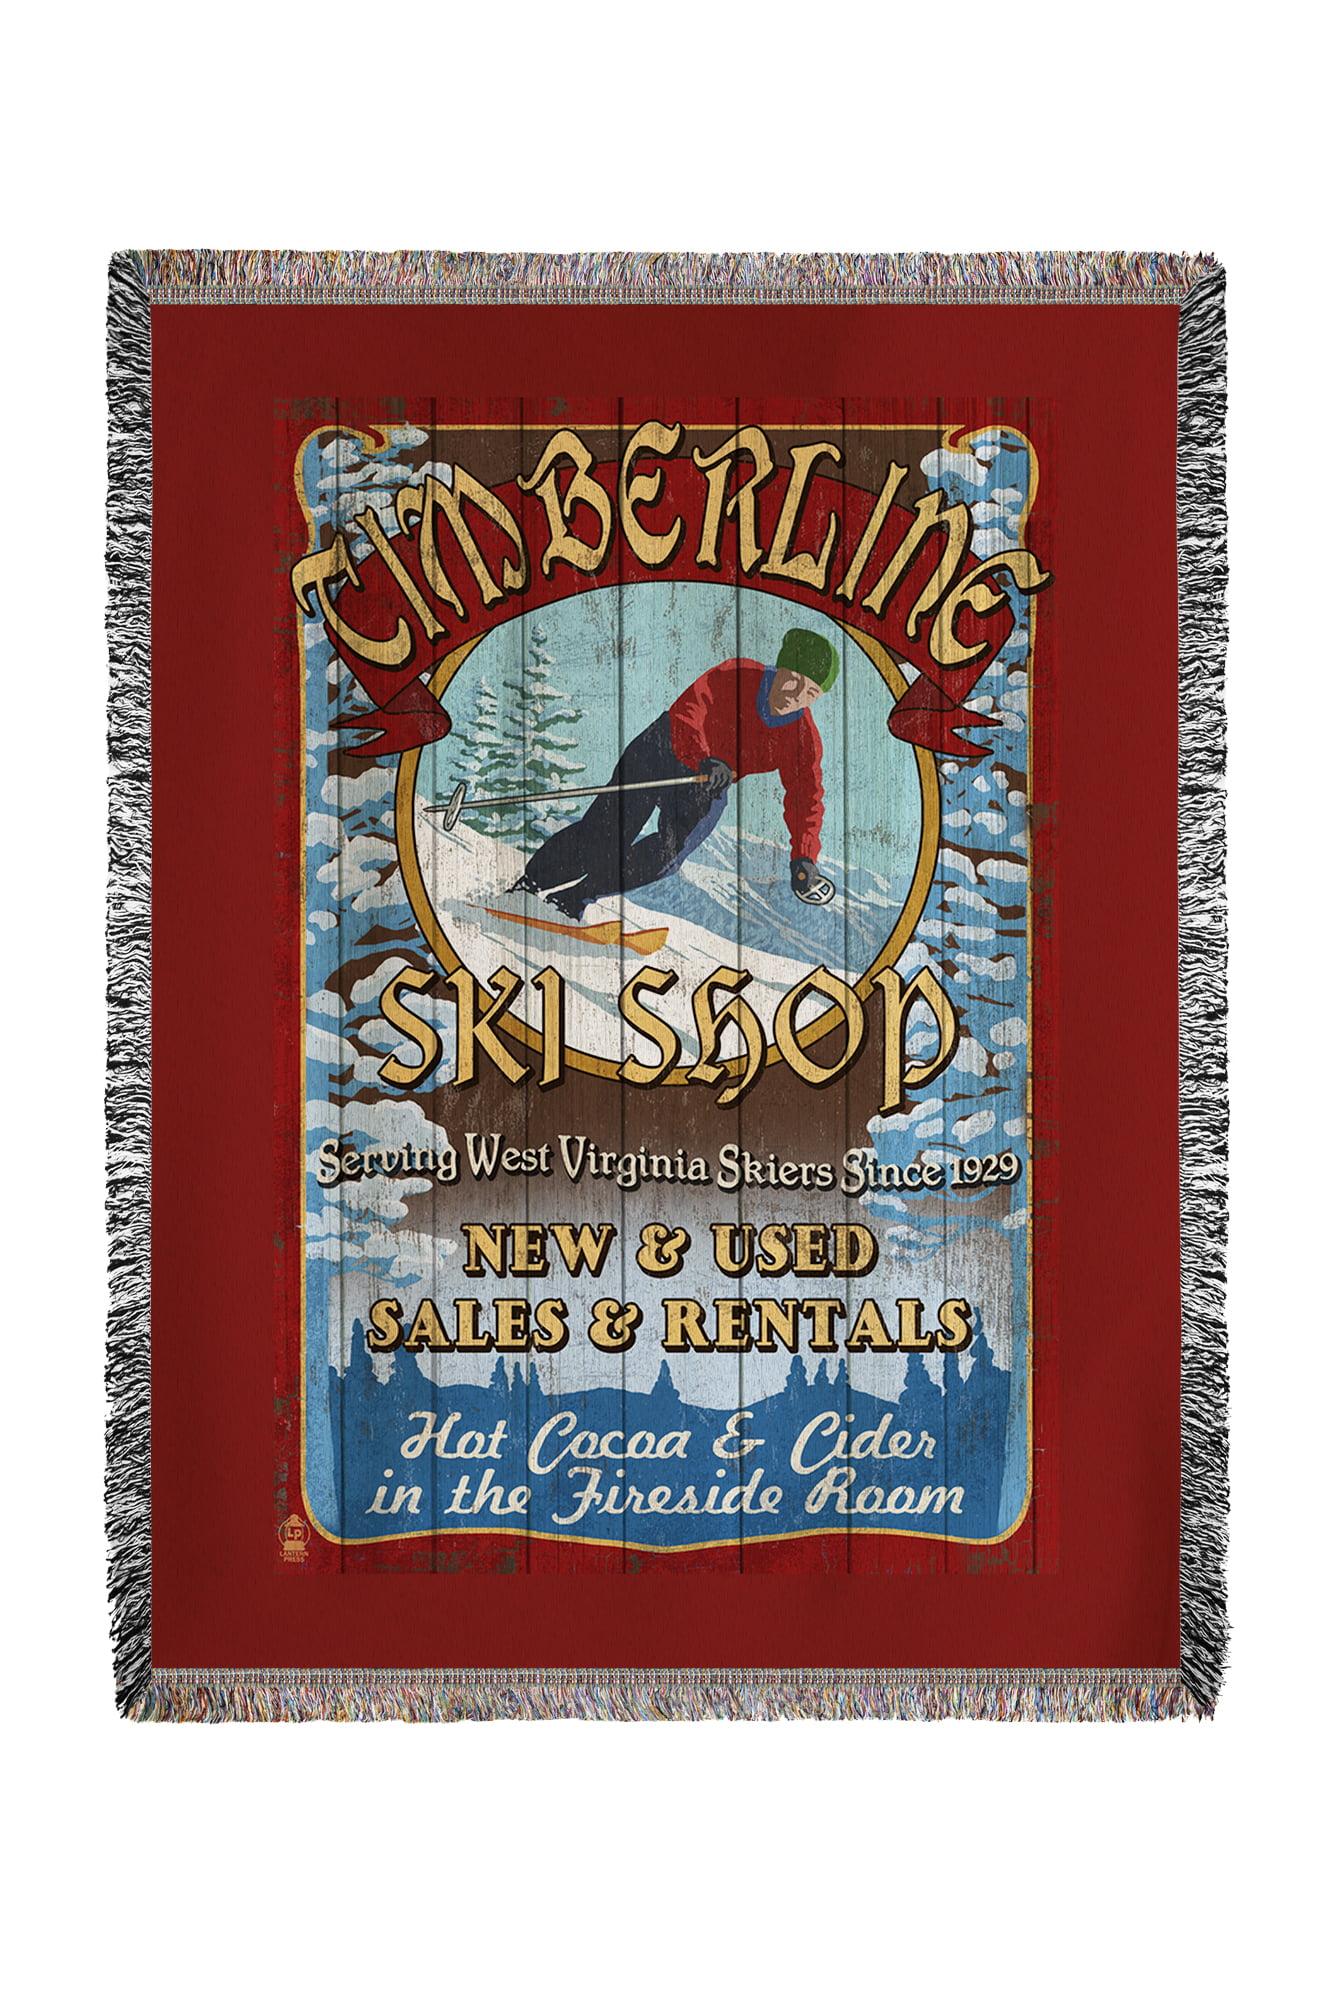 Timberline, West Virginia Ski Shop Vintage Sign Lantern Press Artwork (60x80 Woven Chenille Yarn Blanket) by Lantern Press